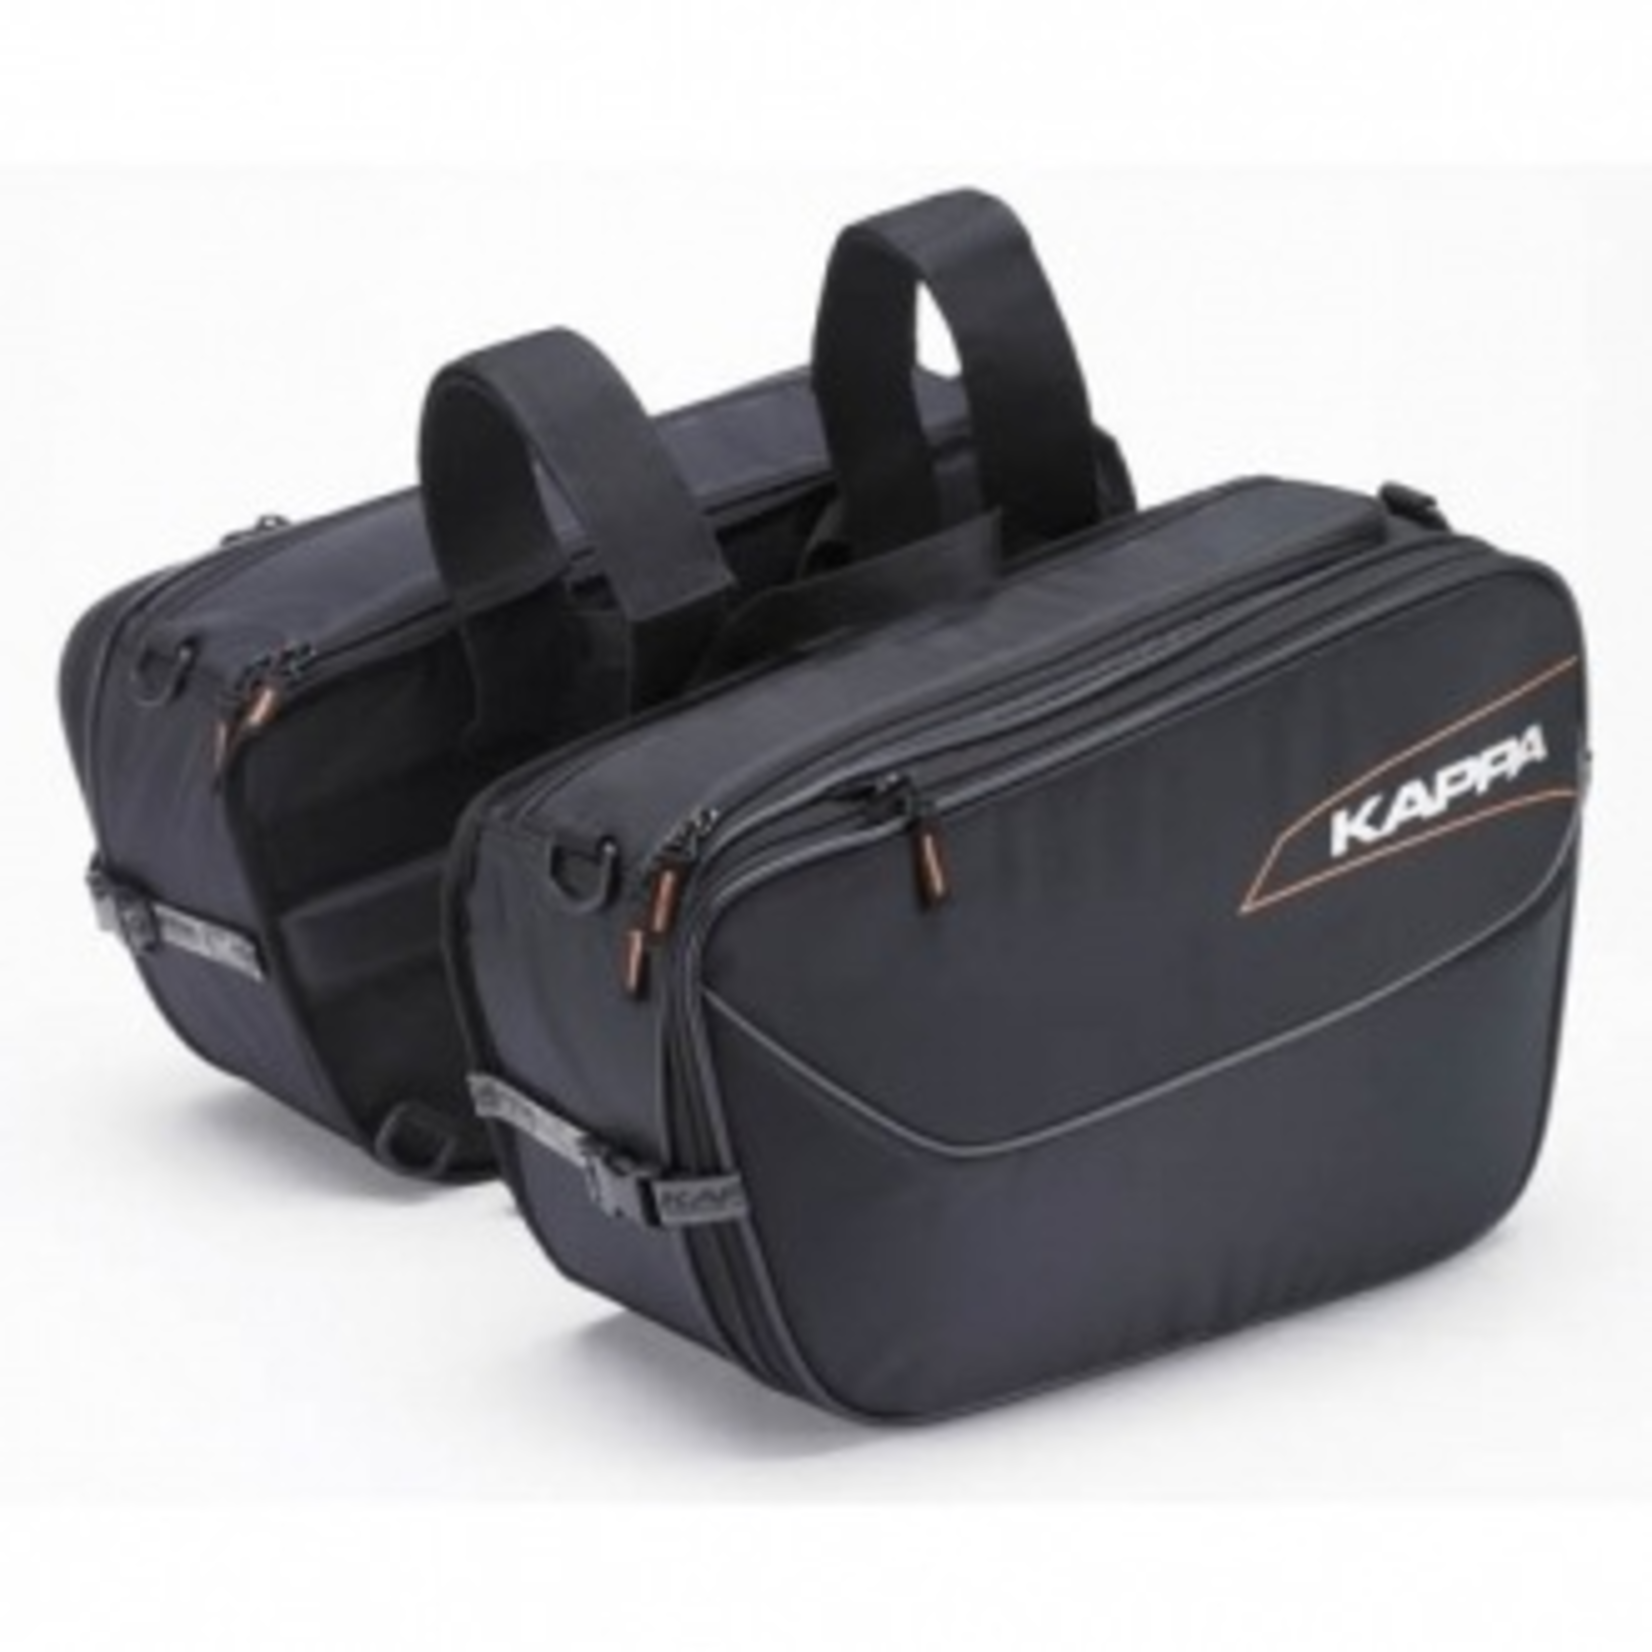 Accessories Saddlebags, Kappa TK750 16-25ltrs